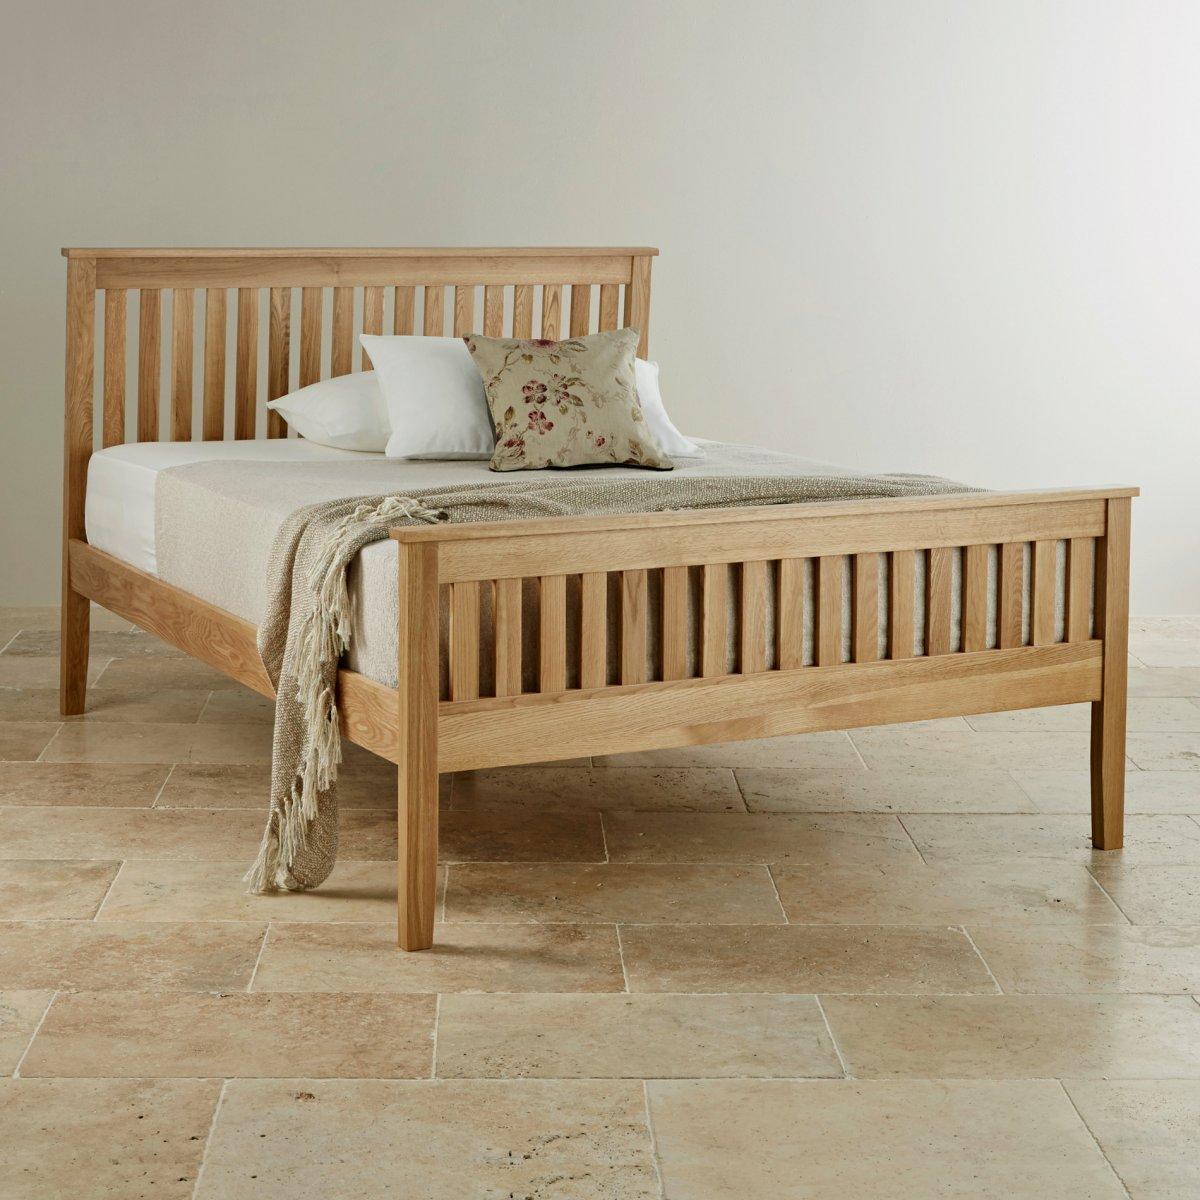 Quality Oak Bedroom Furniture The Cairo Range Natural Solid Oak Furniture